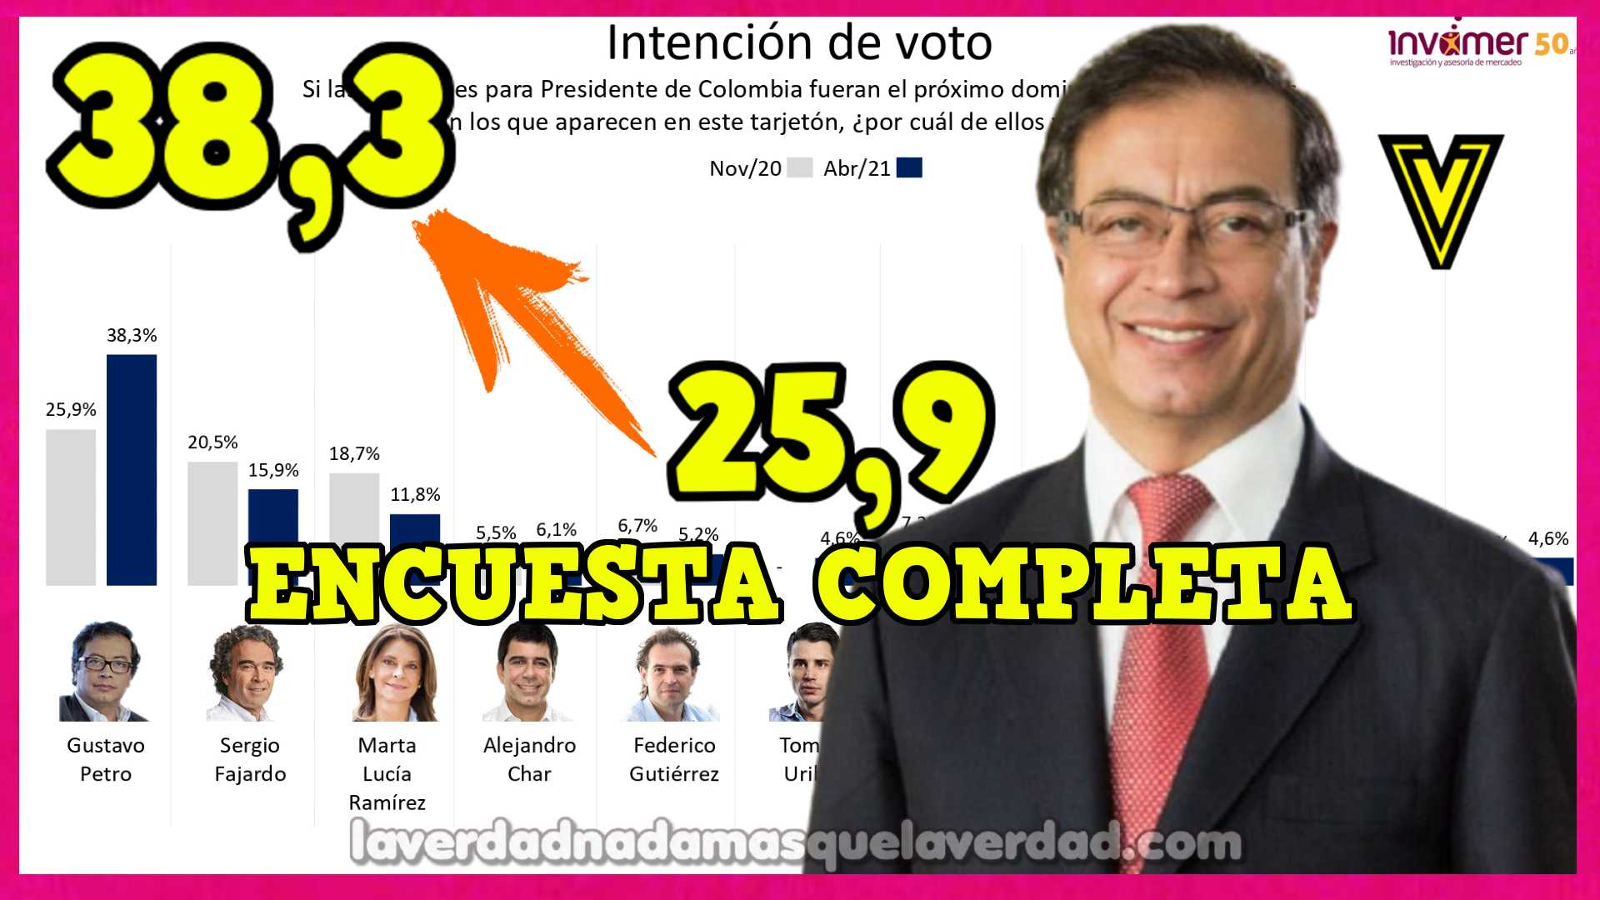 ⭐️ ENCUESTA INVAMER GUSTAVO PETRO DEL 25.9% AL 38.3%